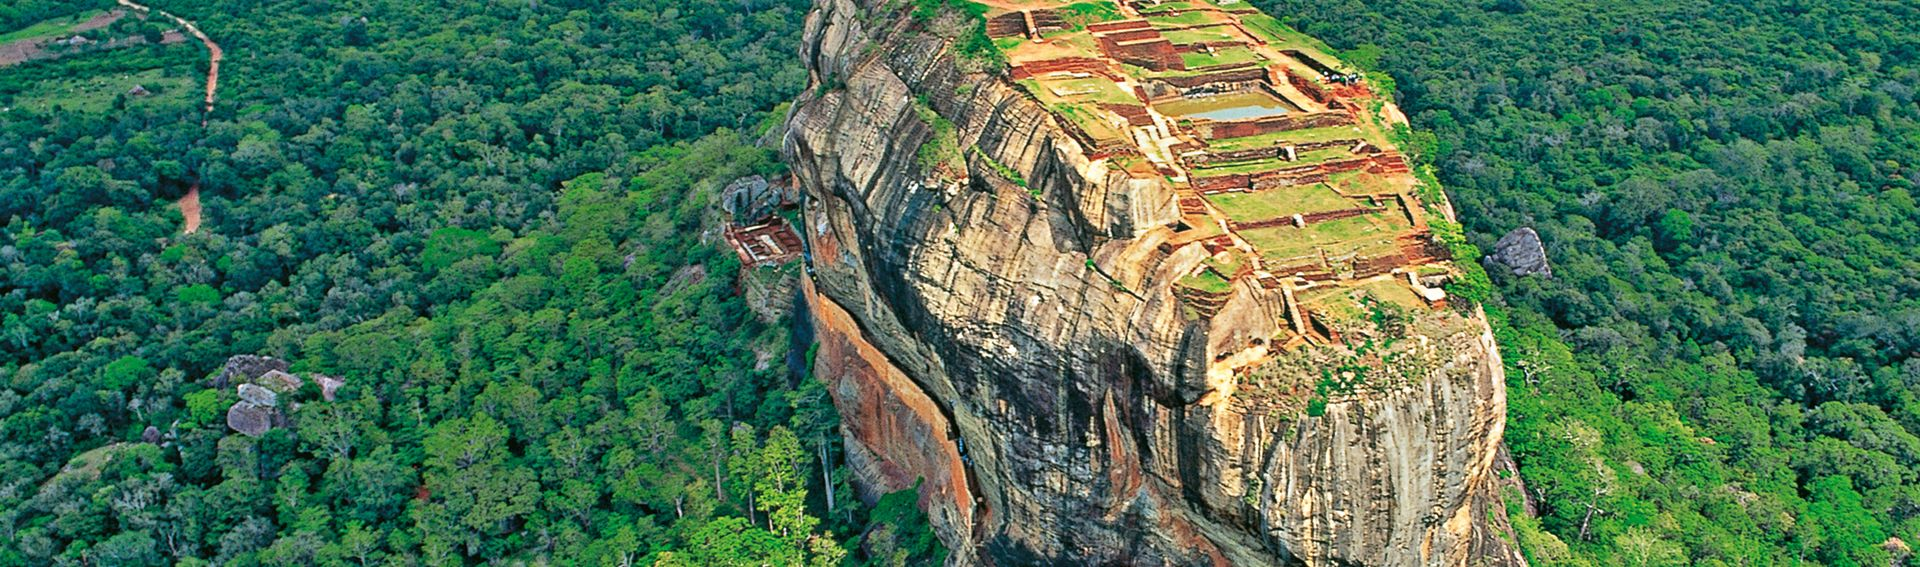 Sri Lanka Landesinneres